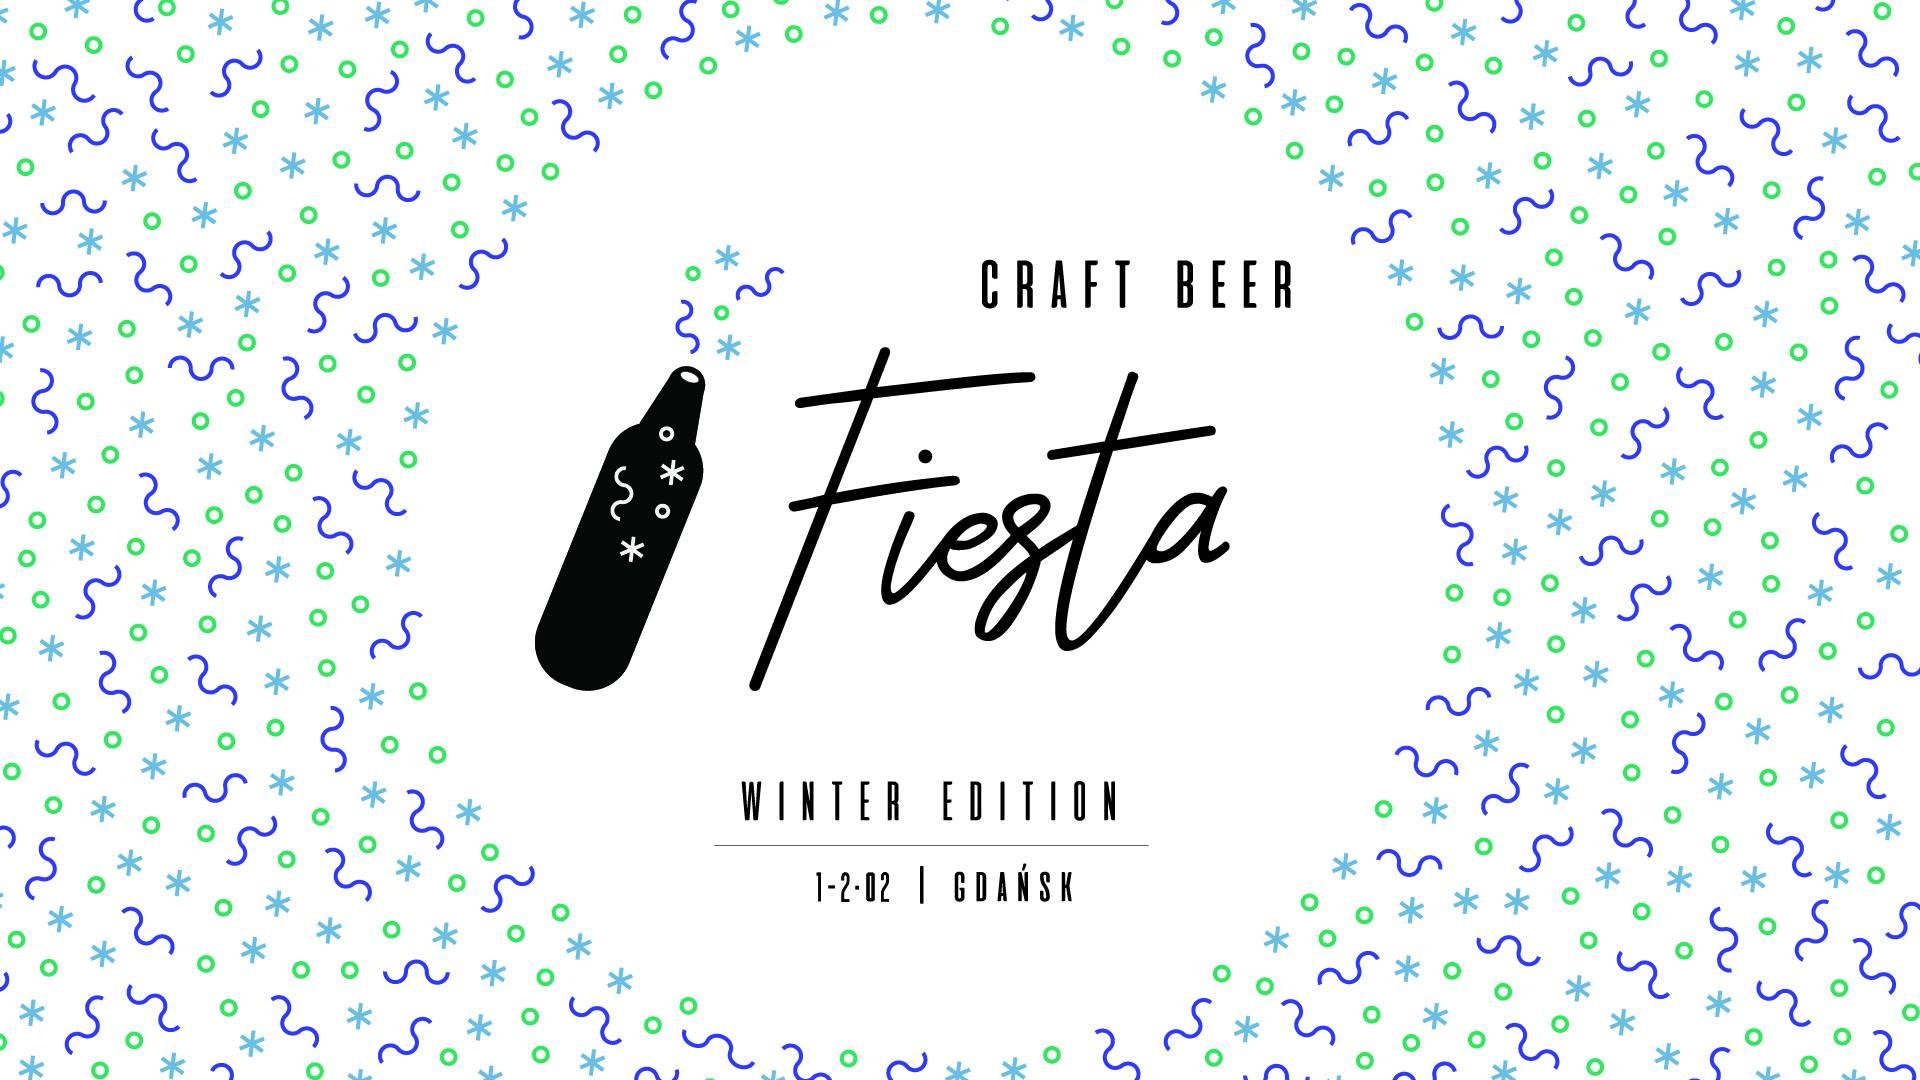 Craft Beer Fiesta 2019 - Winter Edition